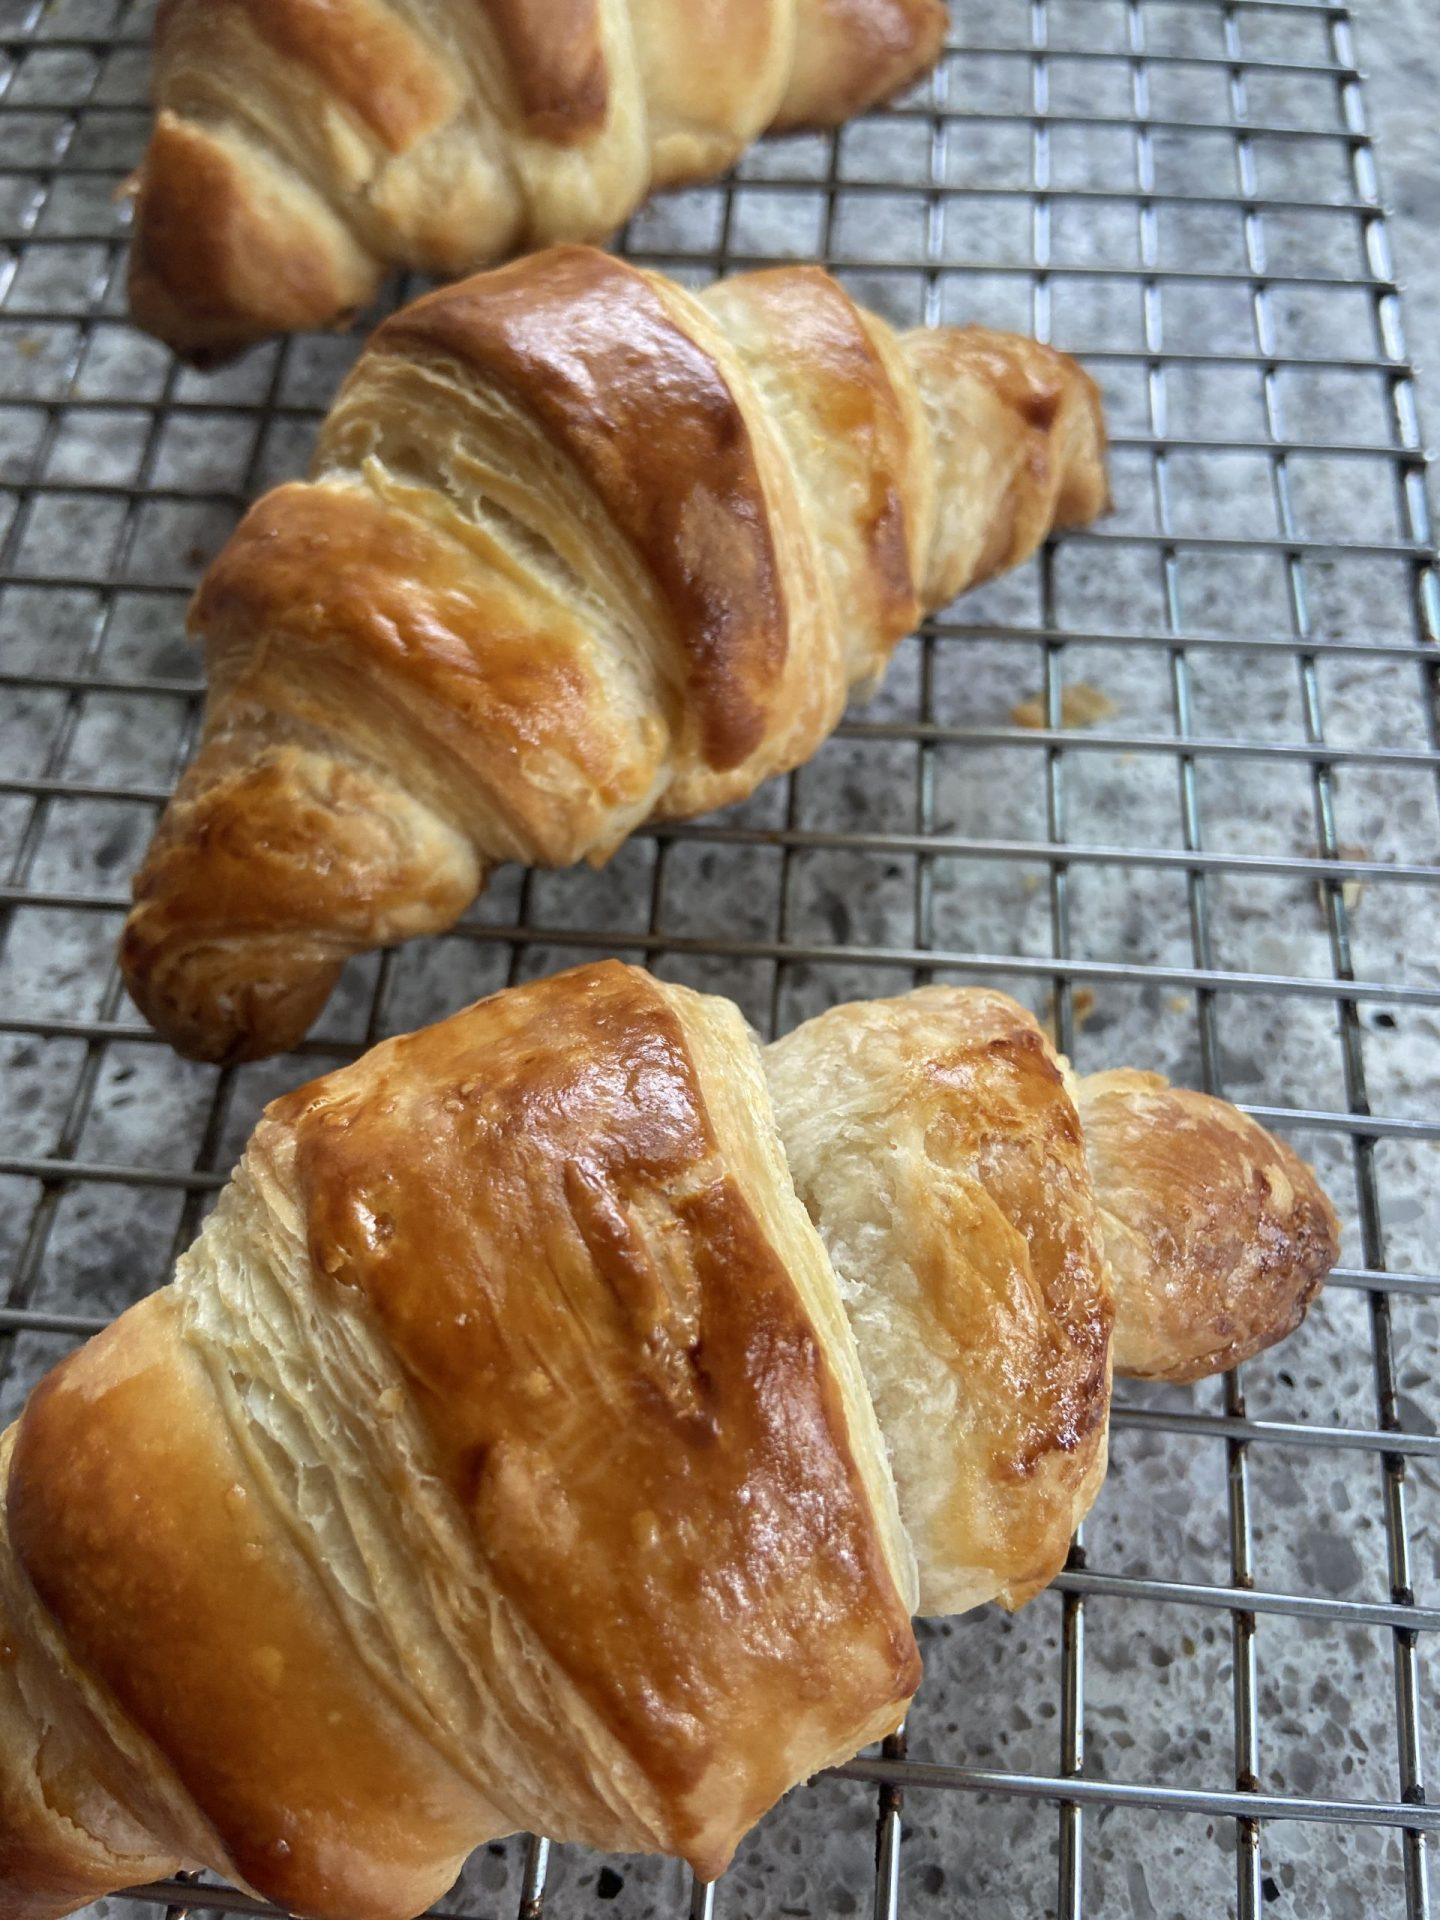 finished batch of croissants eatbaketravel.com